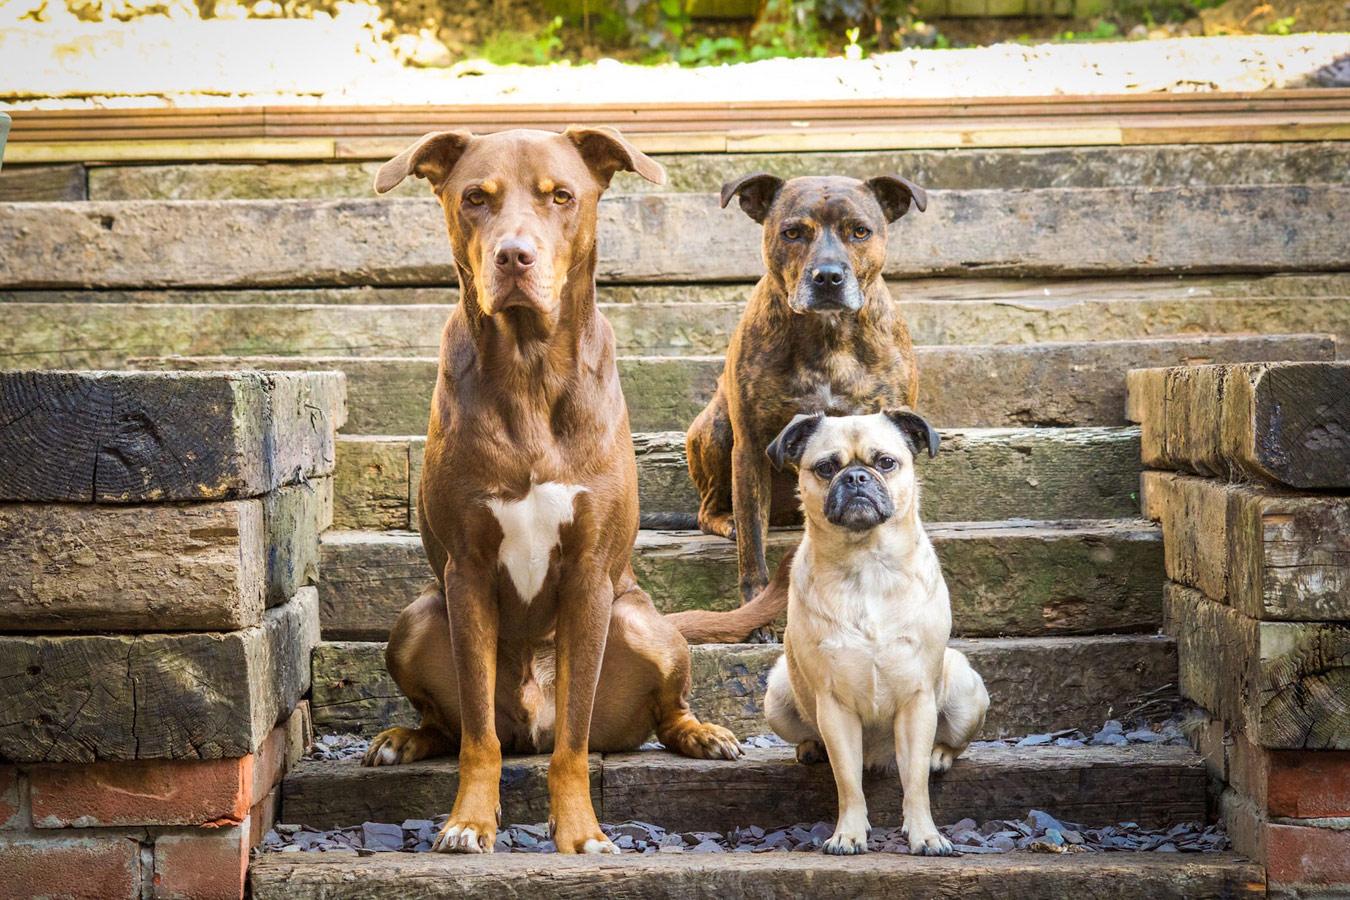 Виктория Уоттс, Великобритания / Victoria Watts, UK, Упоминание жюри, Фотоконкурс Dog Photographer of the Year